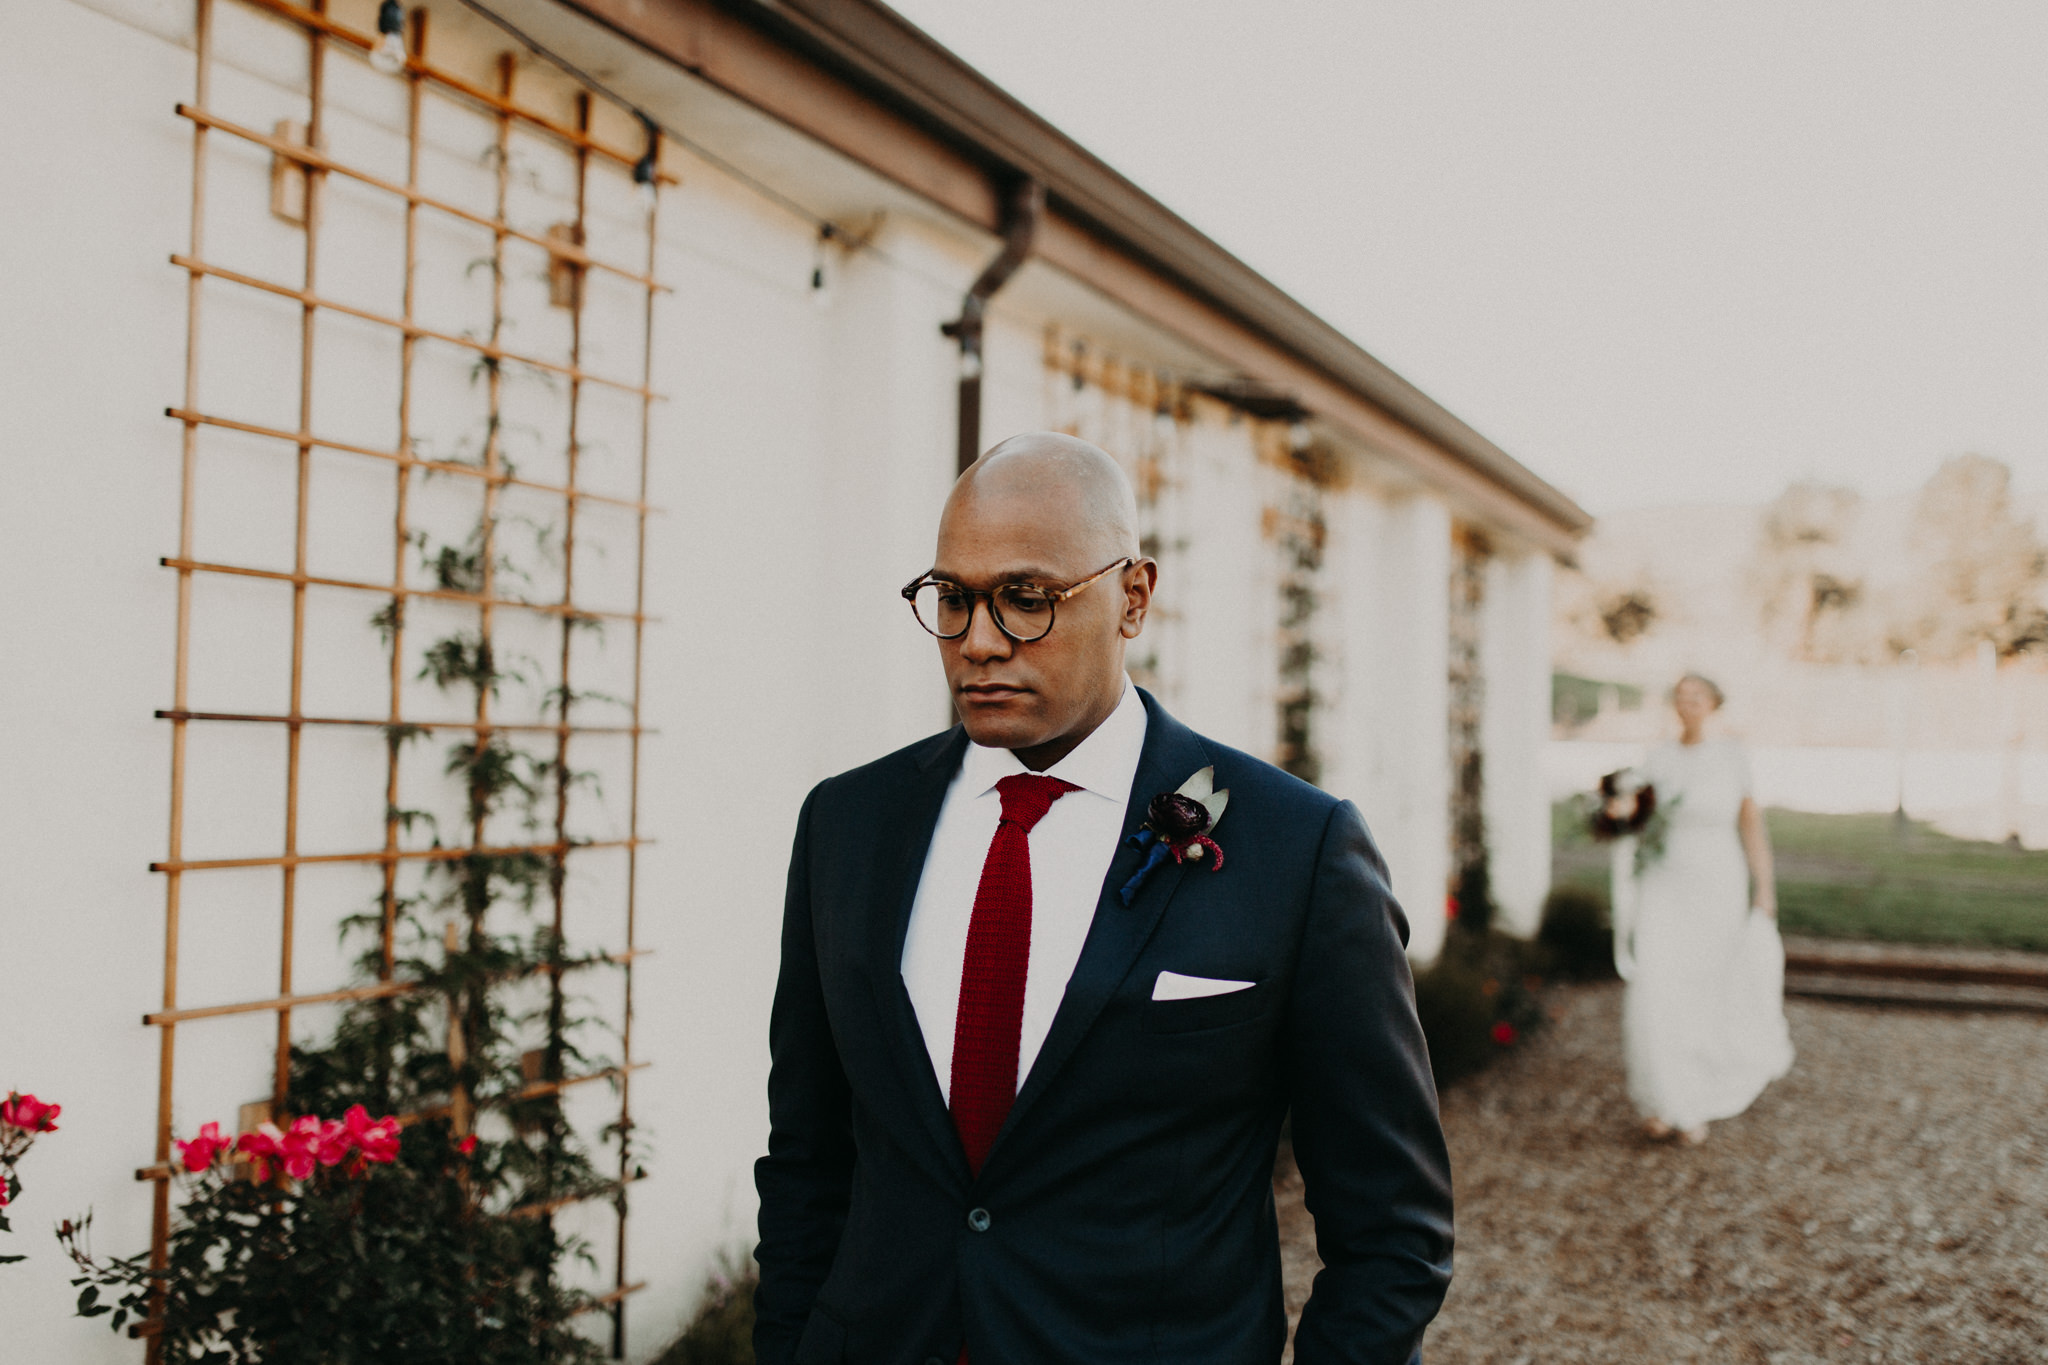 couple-wedding-carmel-wedding-23.jpg